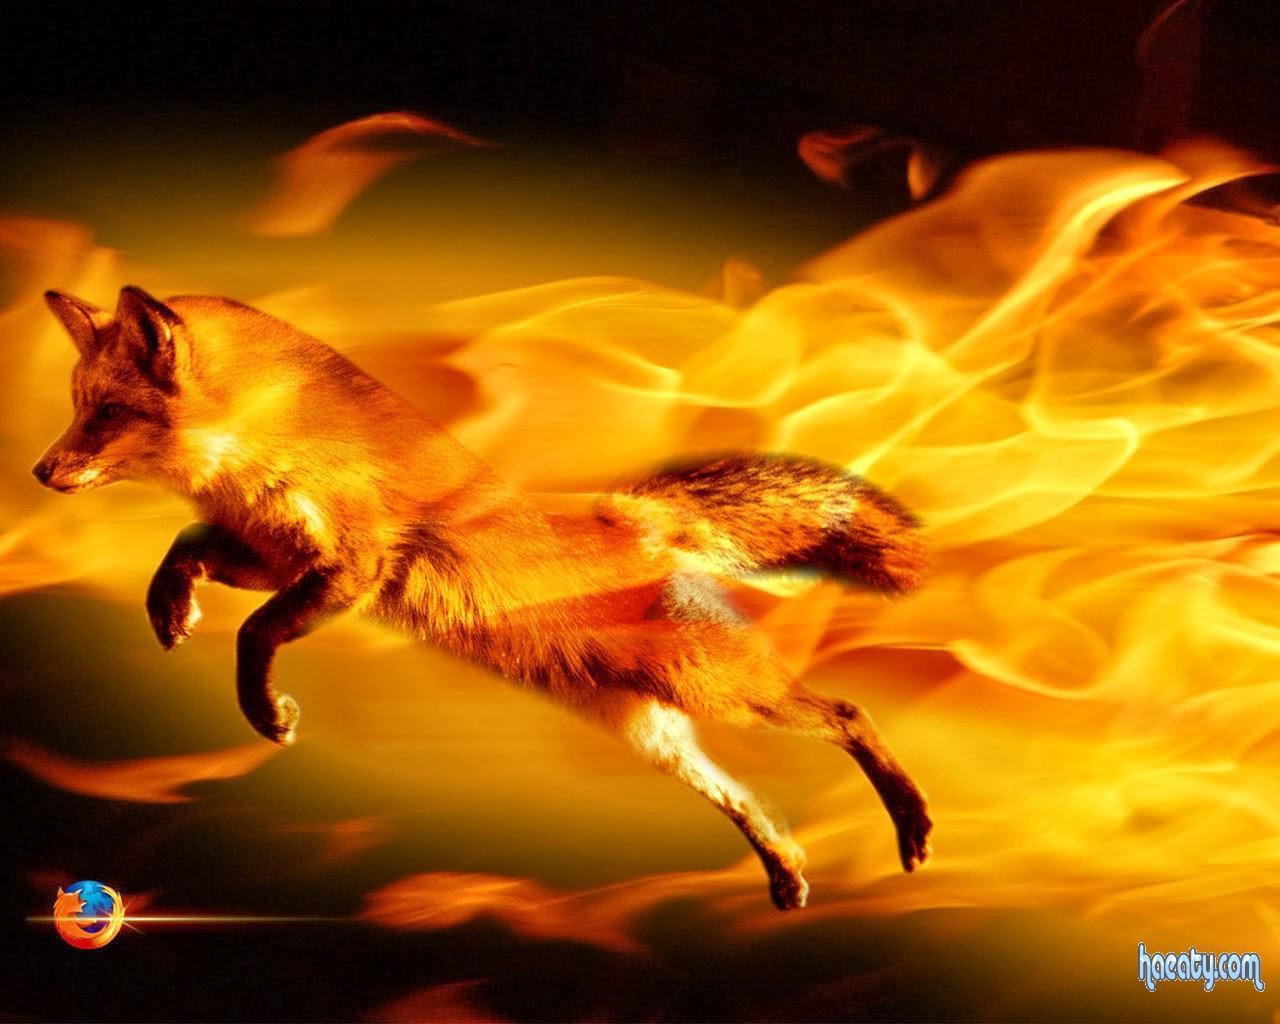 Download Mozilla Firefox free 1394958568992.jpg